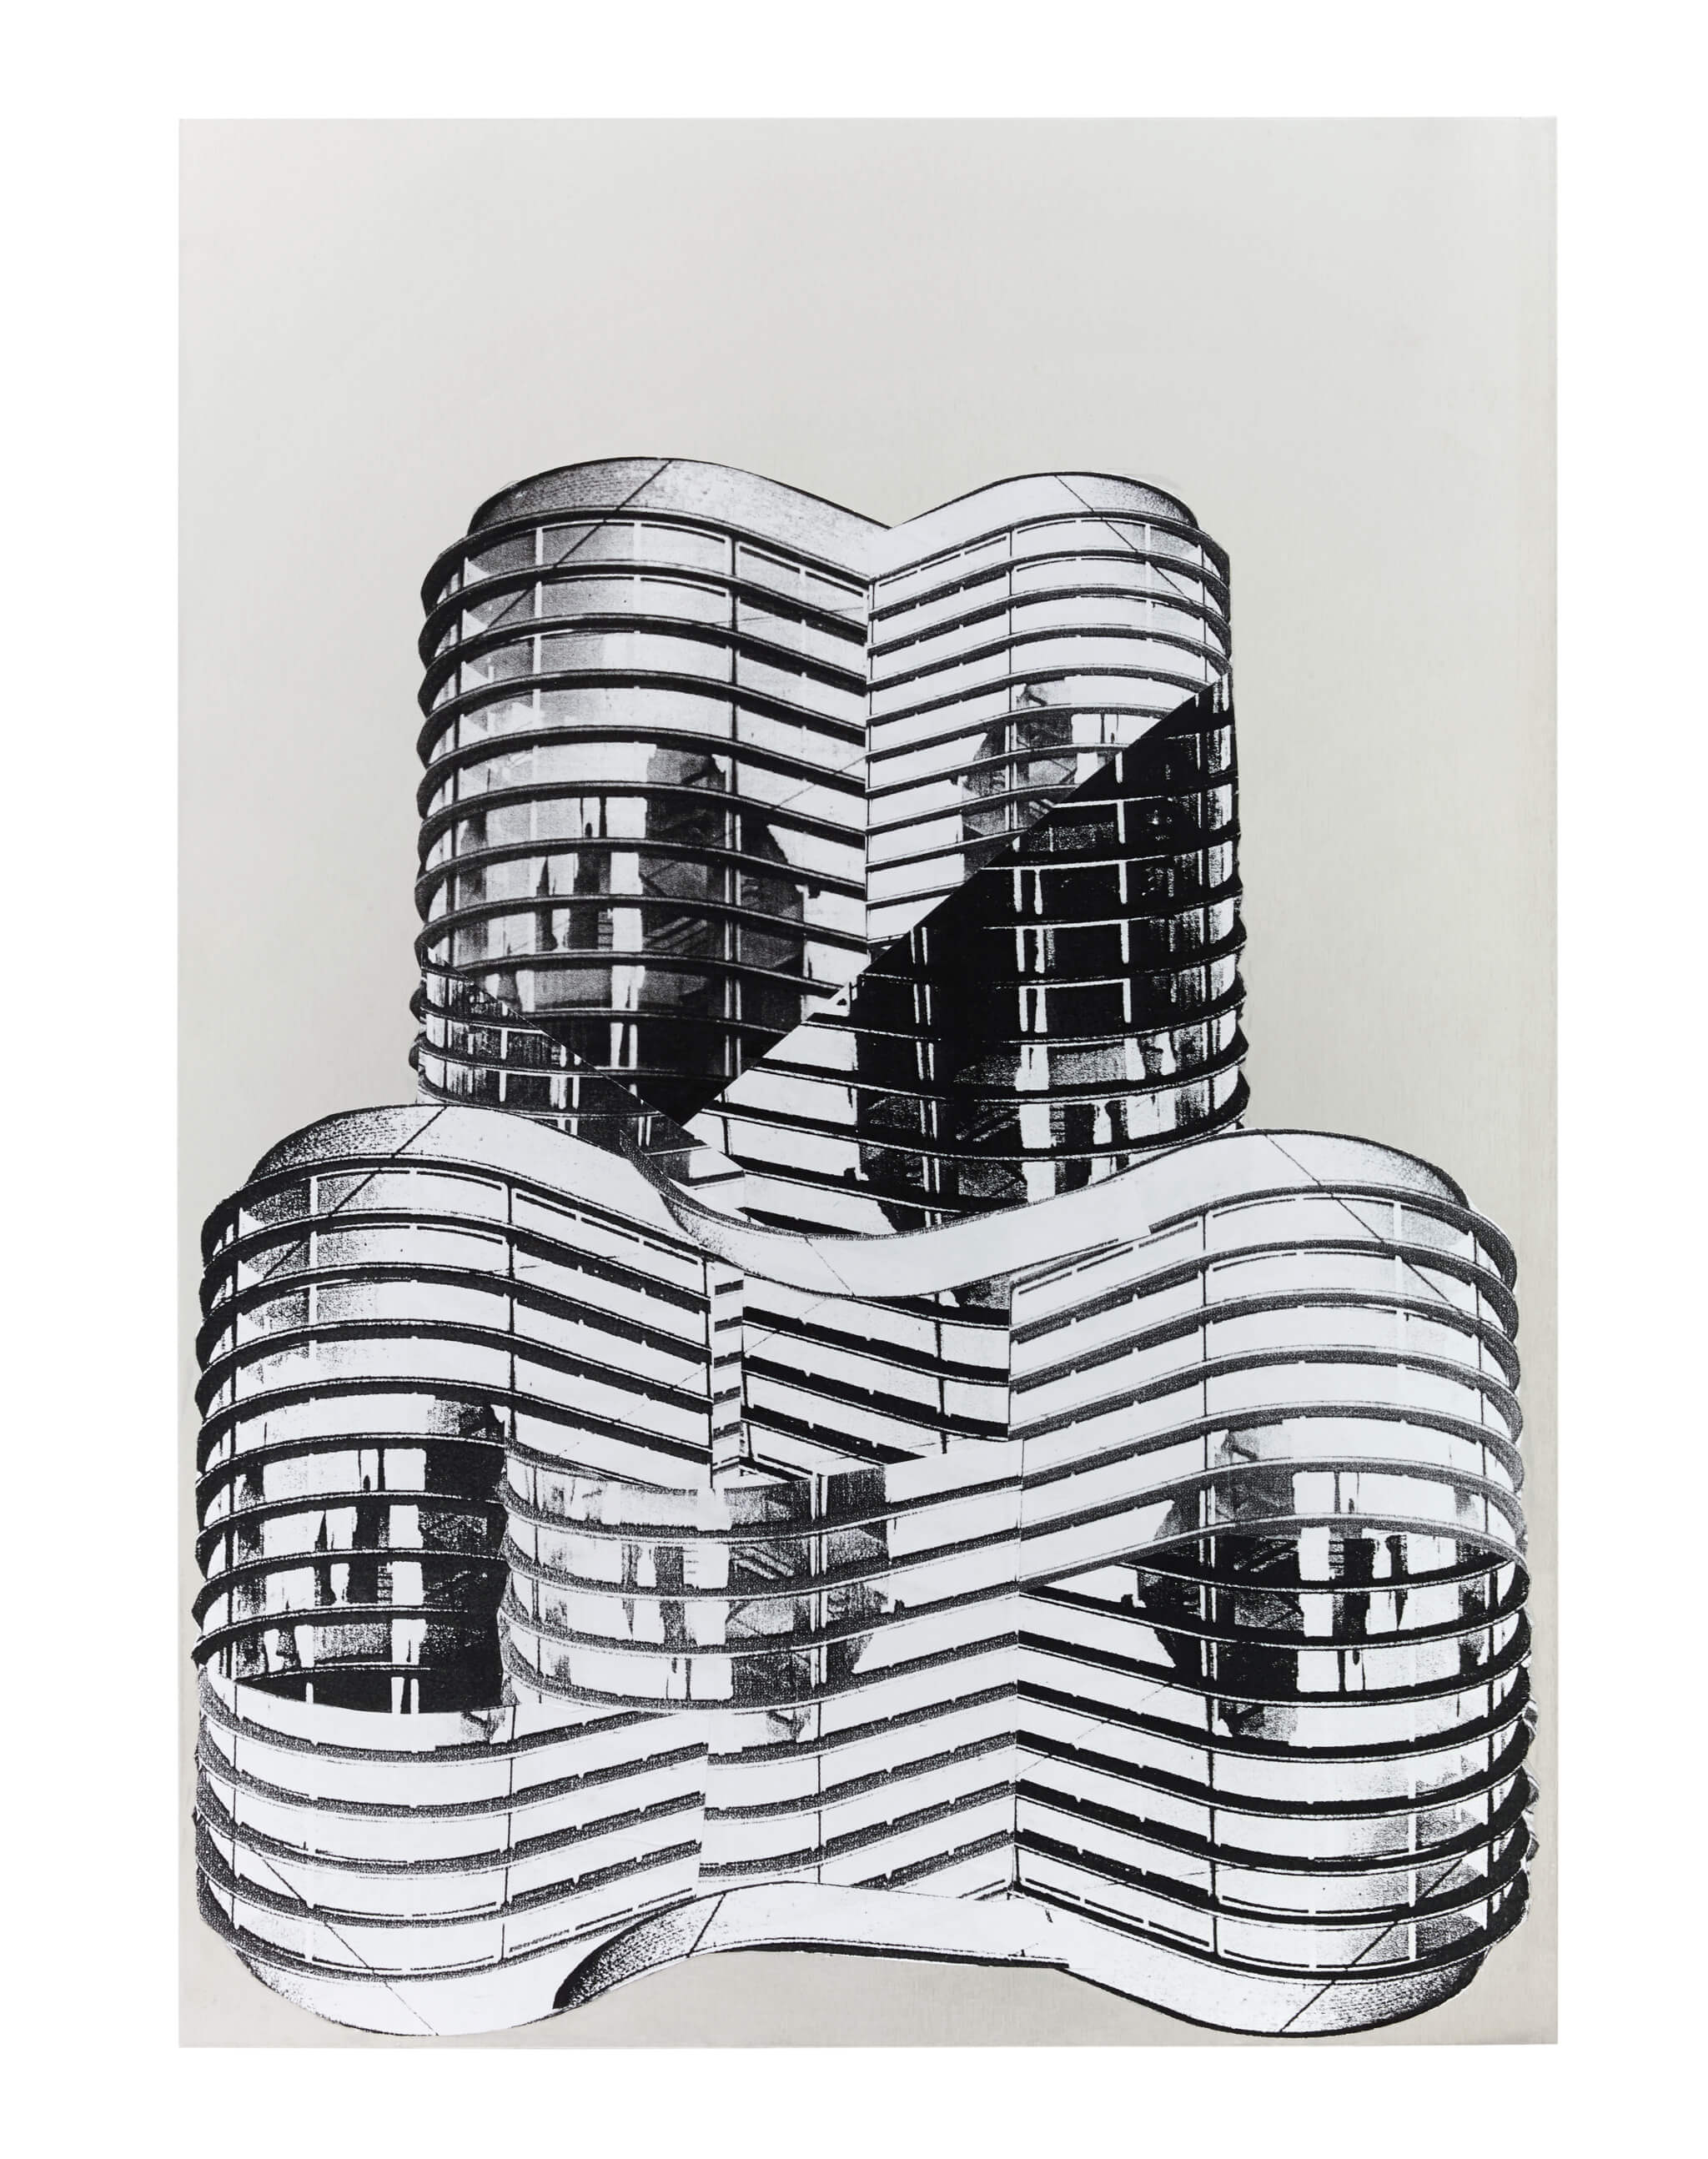 81_Frauke-Dannert_Collage_Papiercollage-auf-Aluminium_Ohne-Titel-2014